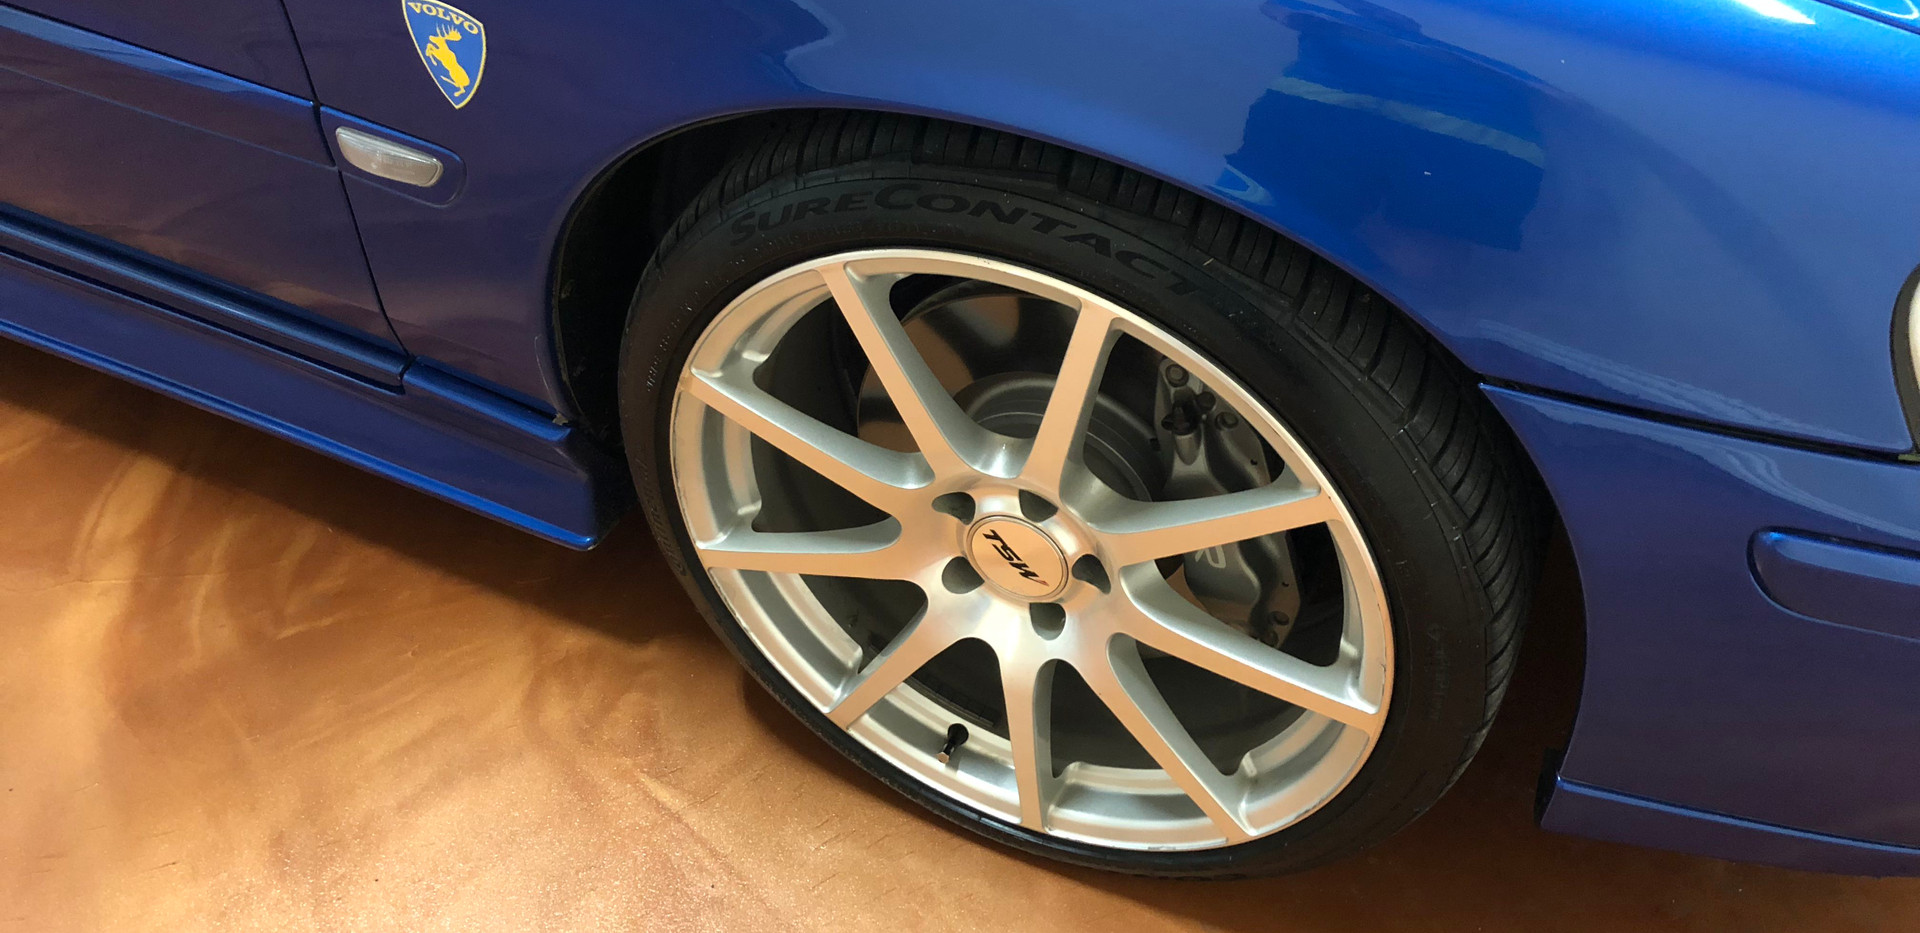 volvo front passenger wheel garage 52.jp